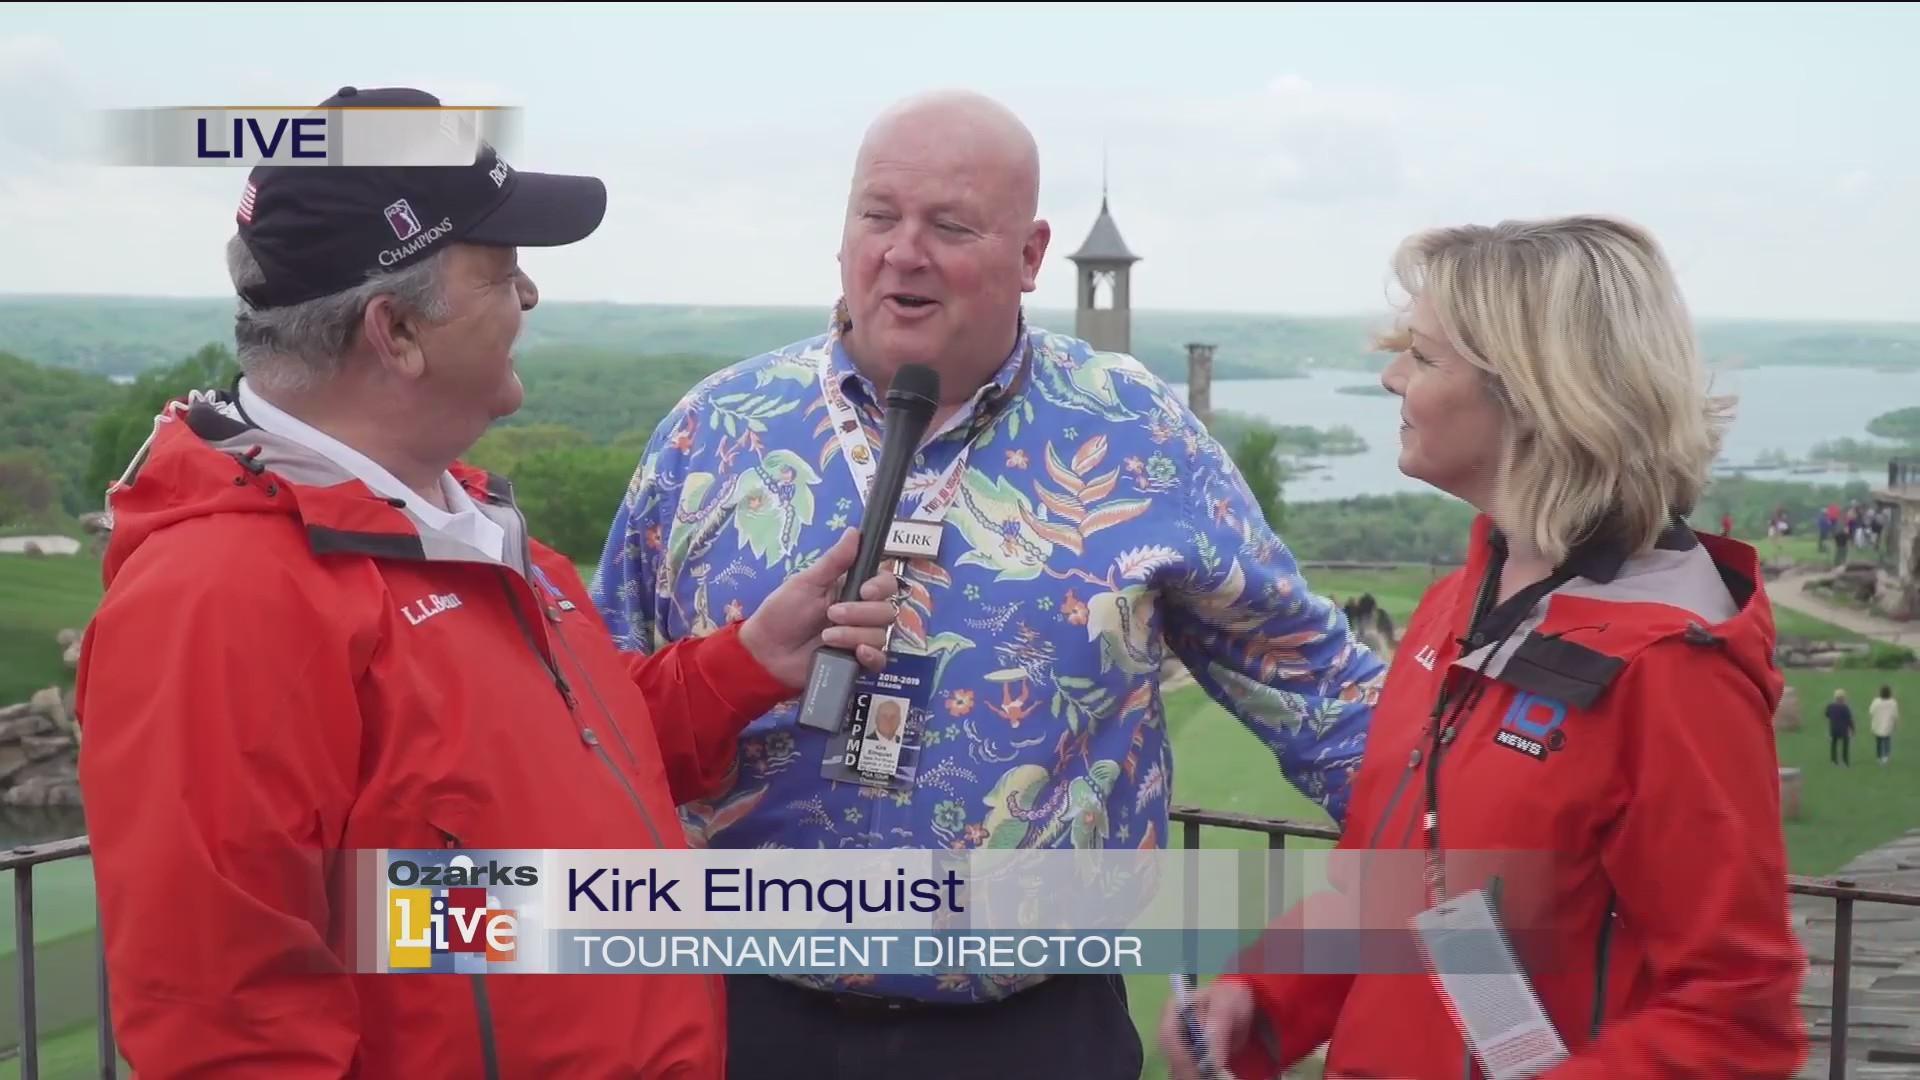 Kirk Elmquist - Legends of Golf - 4/25/19